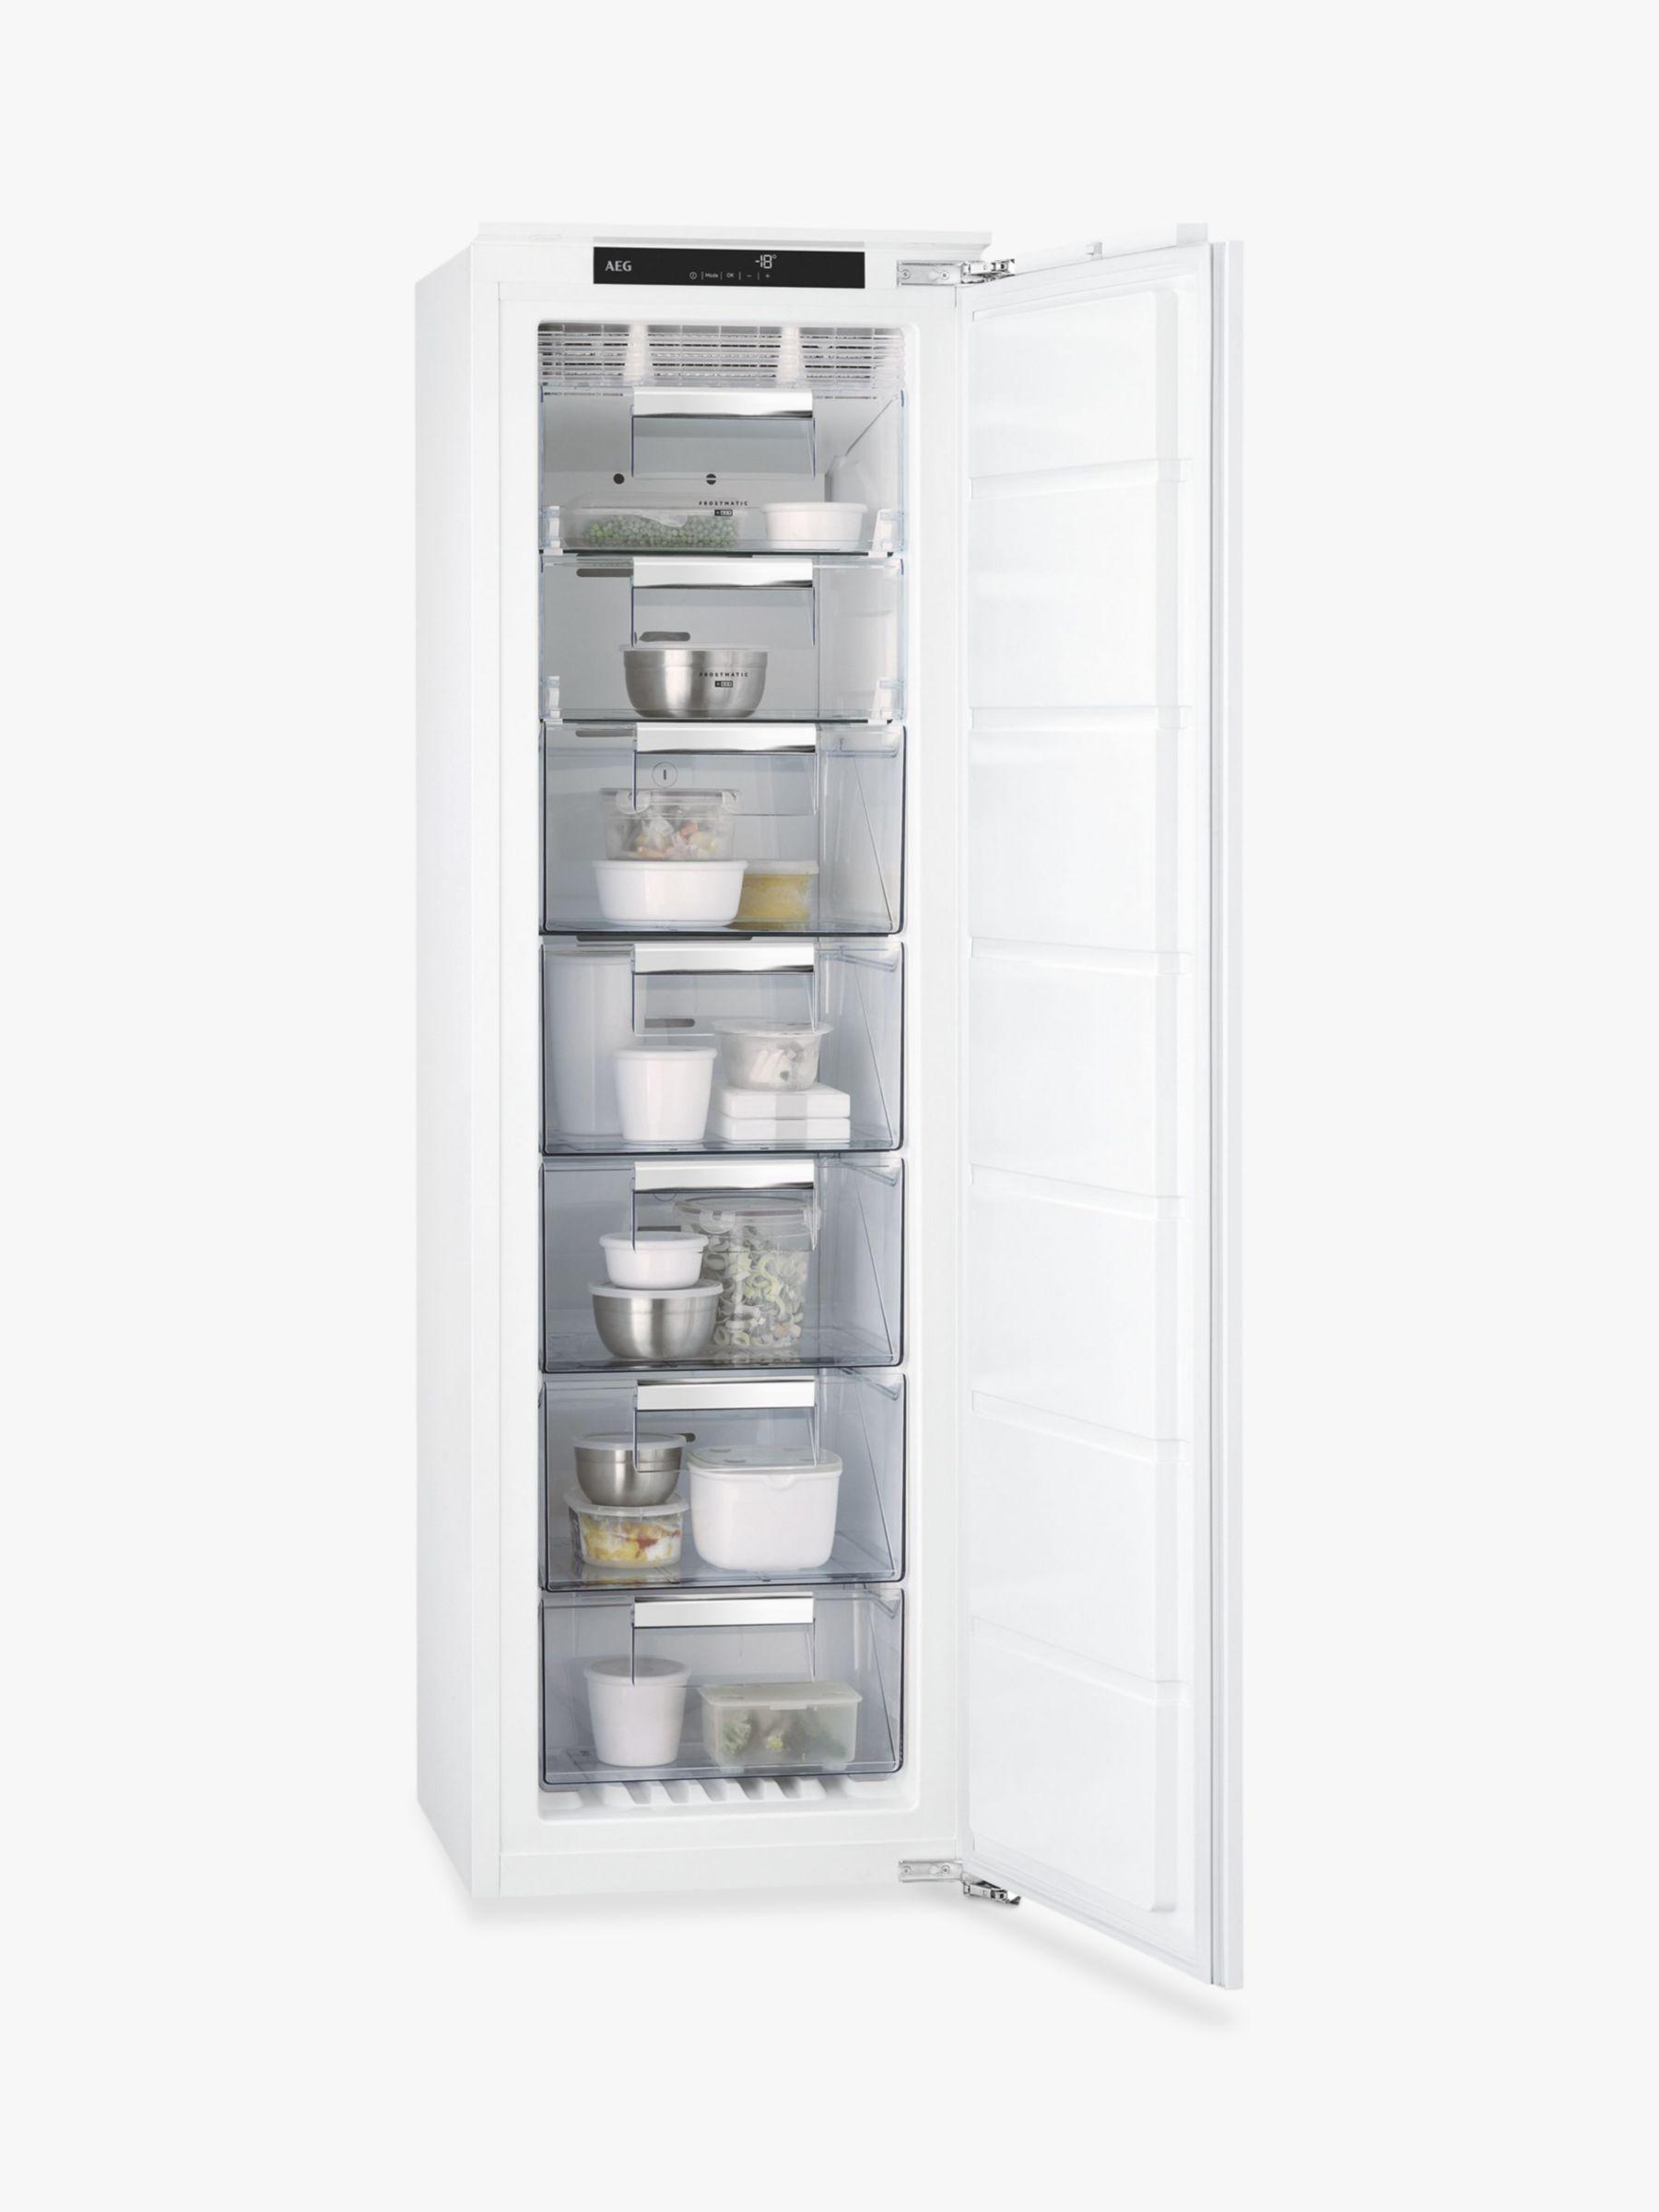 AEG AEG ABB8181VNC Integrated Freezer, A+ Energy Rating, 56cm Wide, White